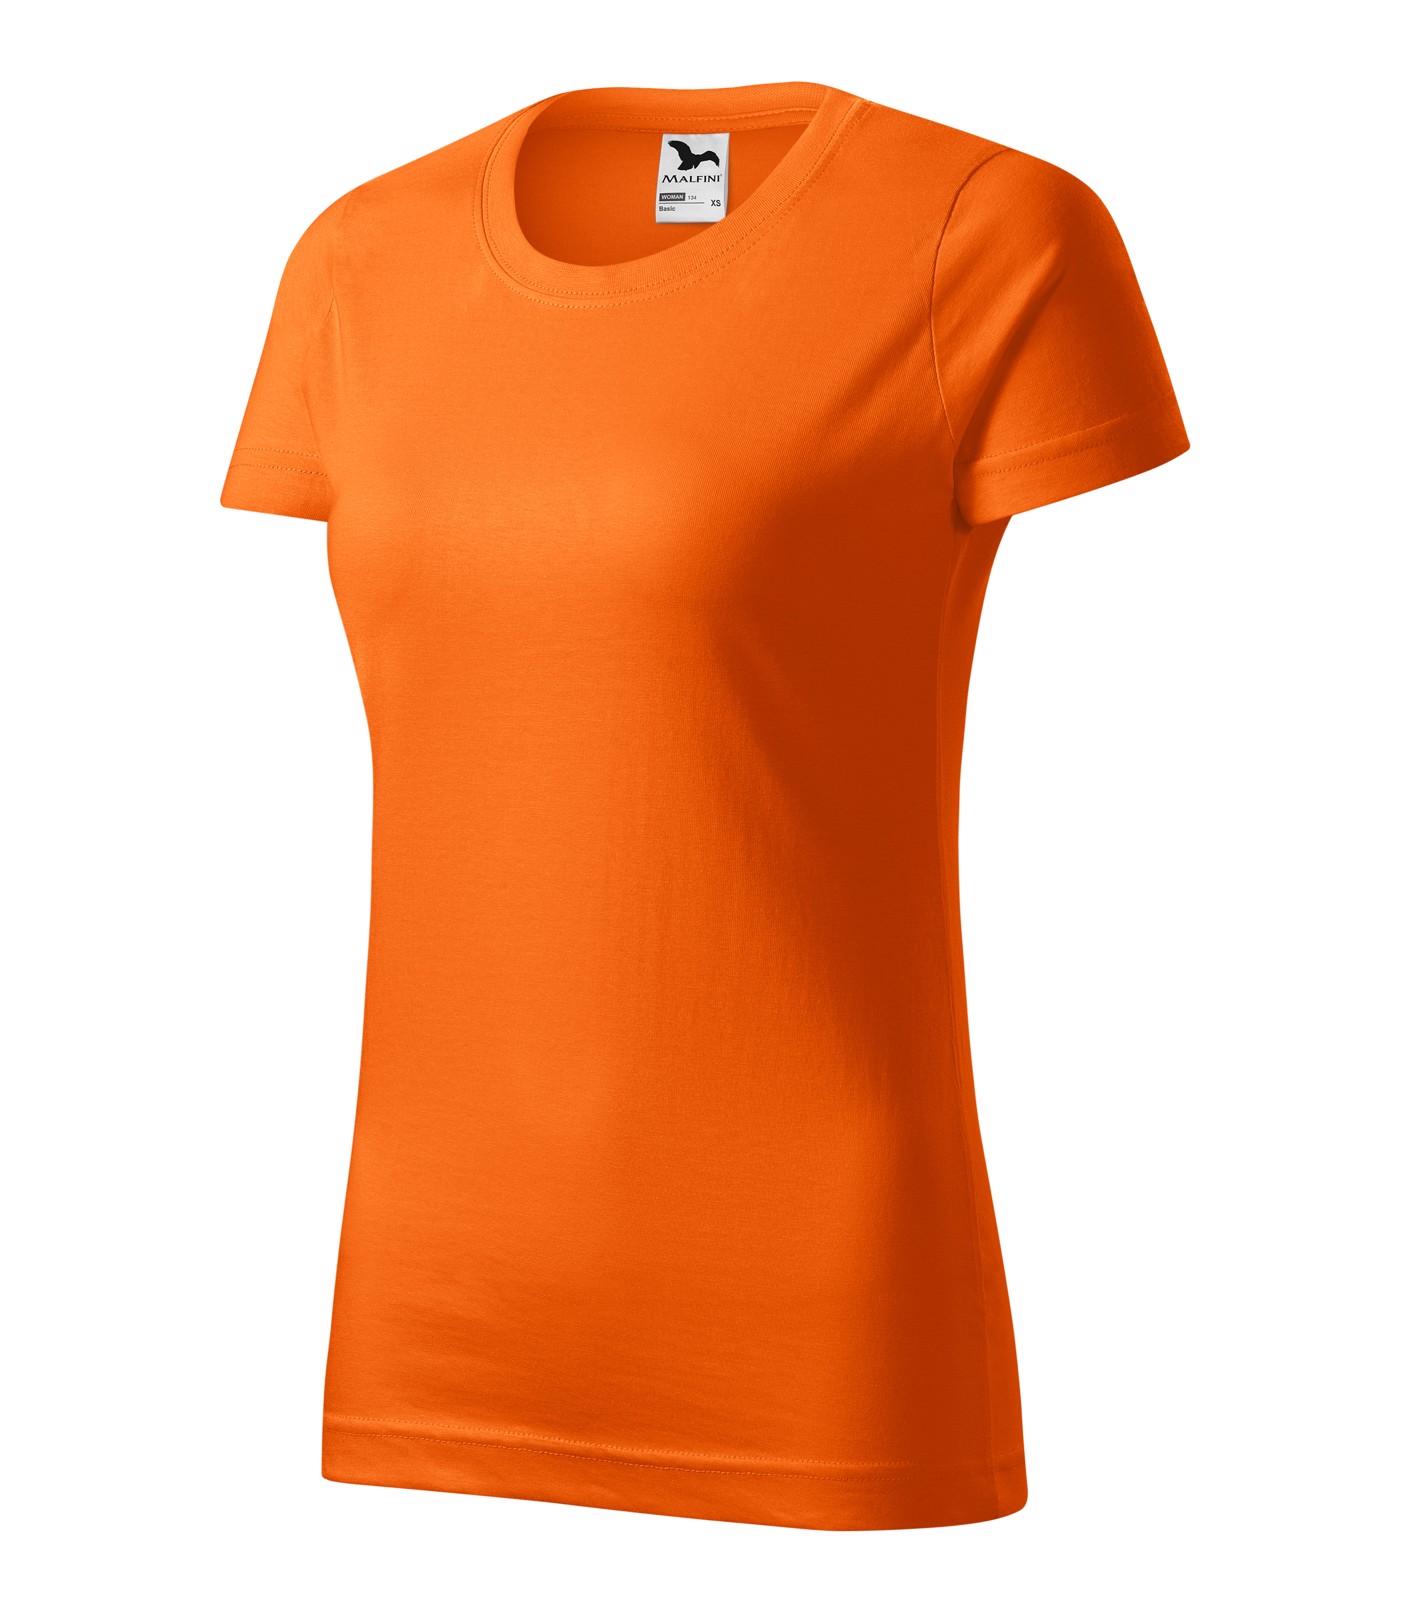 T-shirt women's Malfini Basic - Orange / 2XL